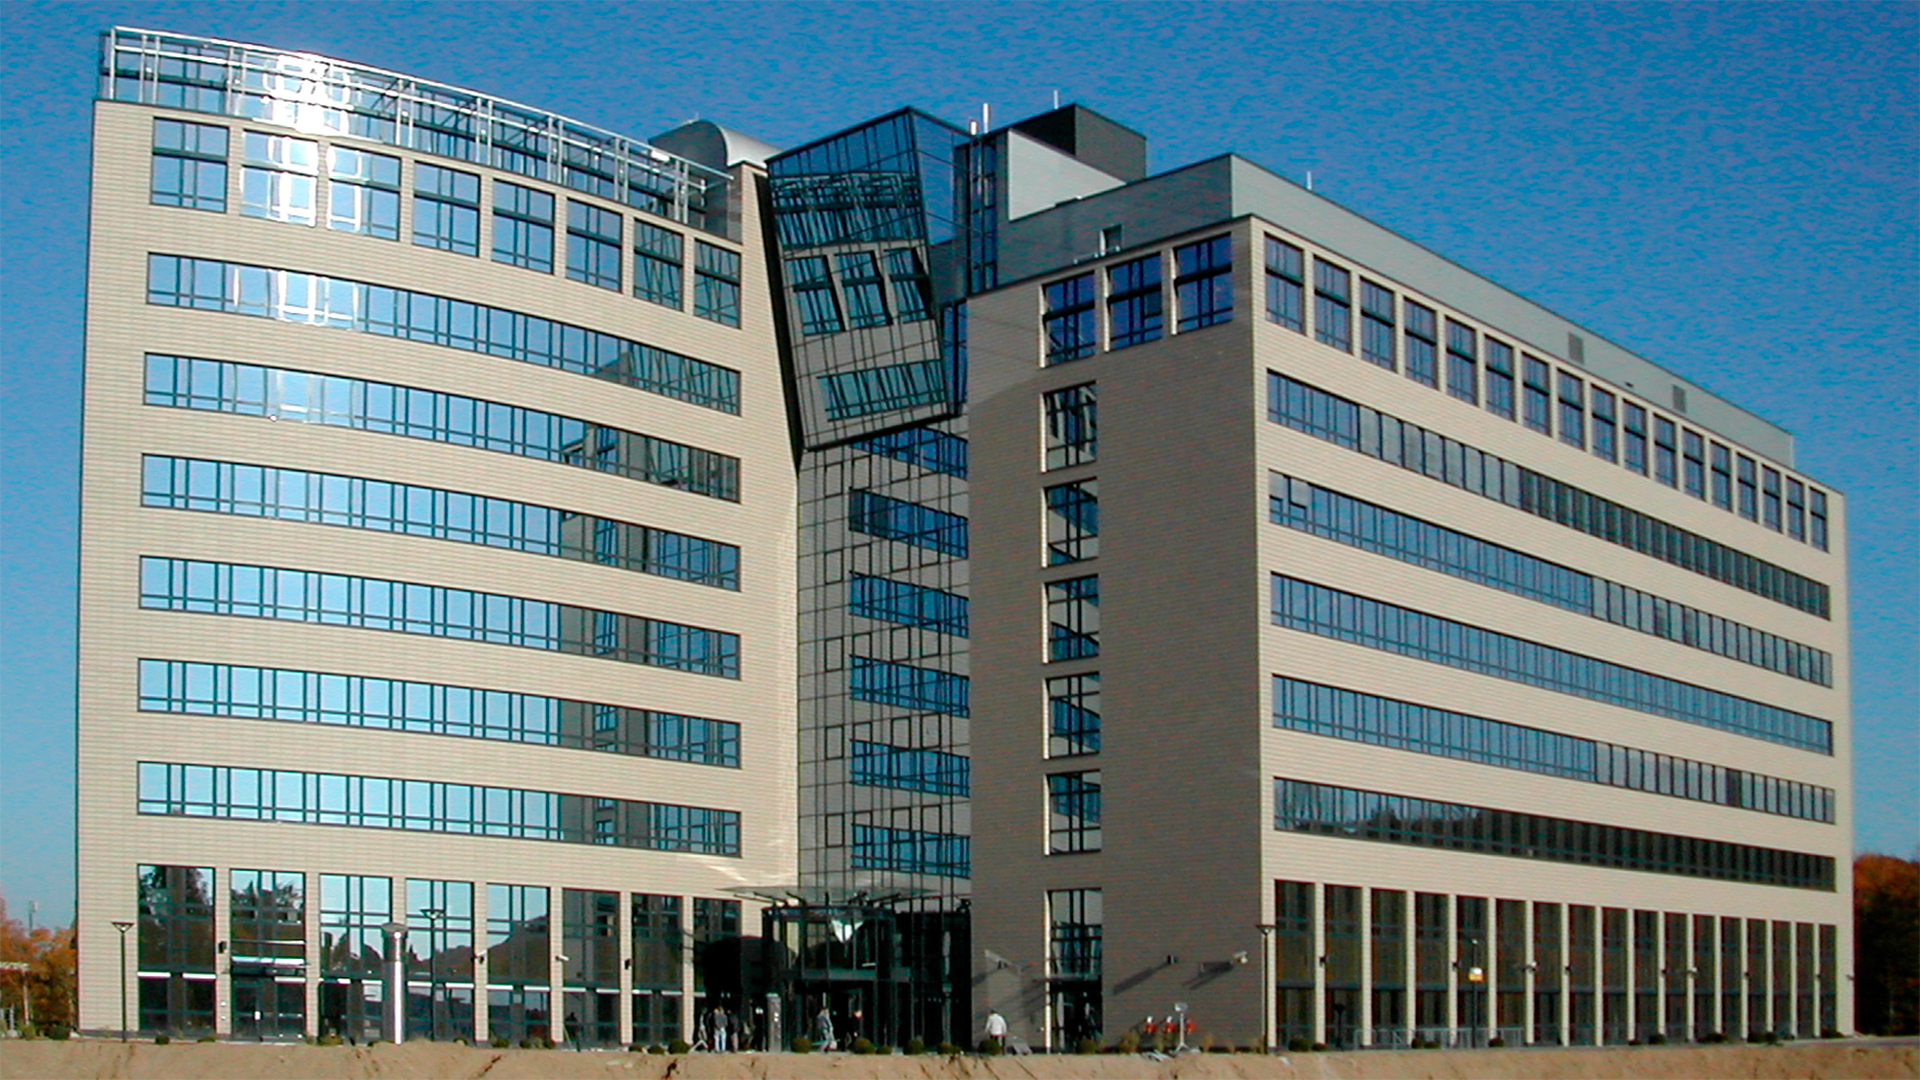 HITEC – International Business Center